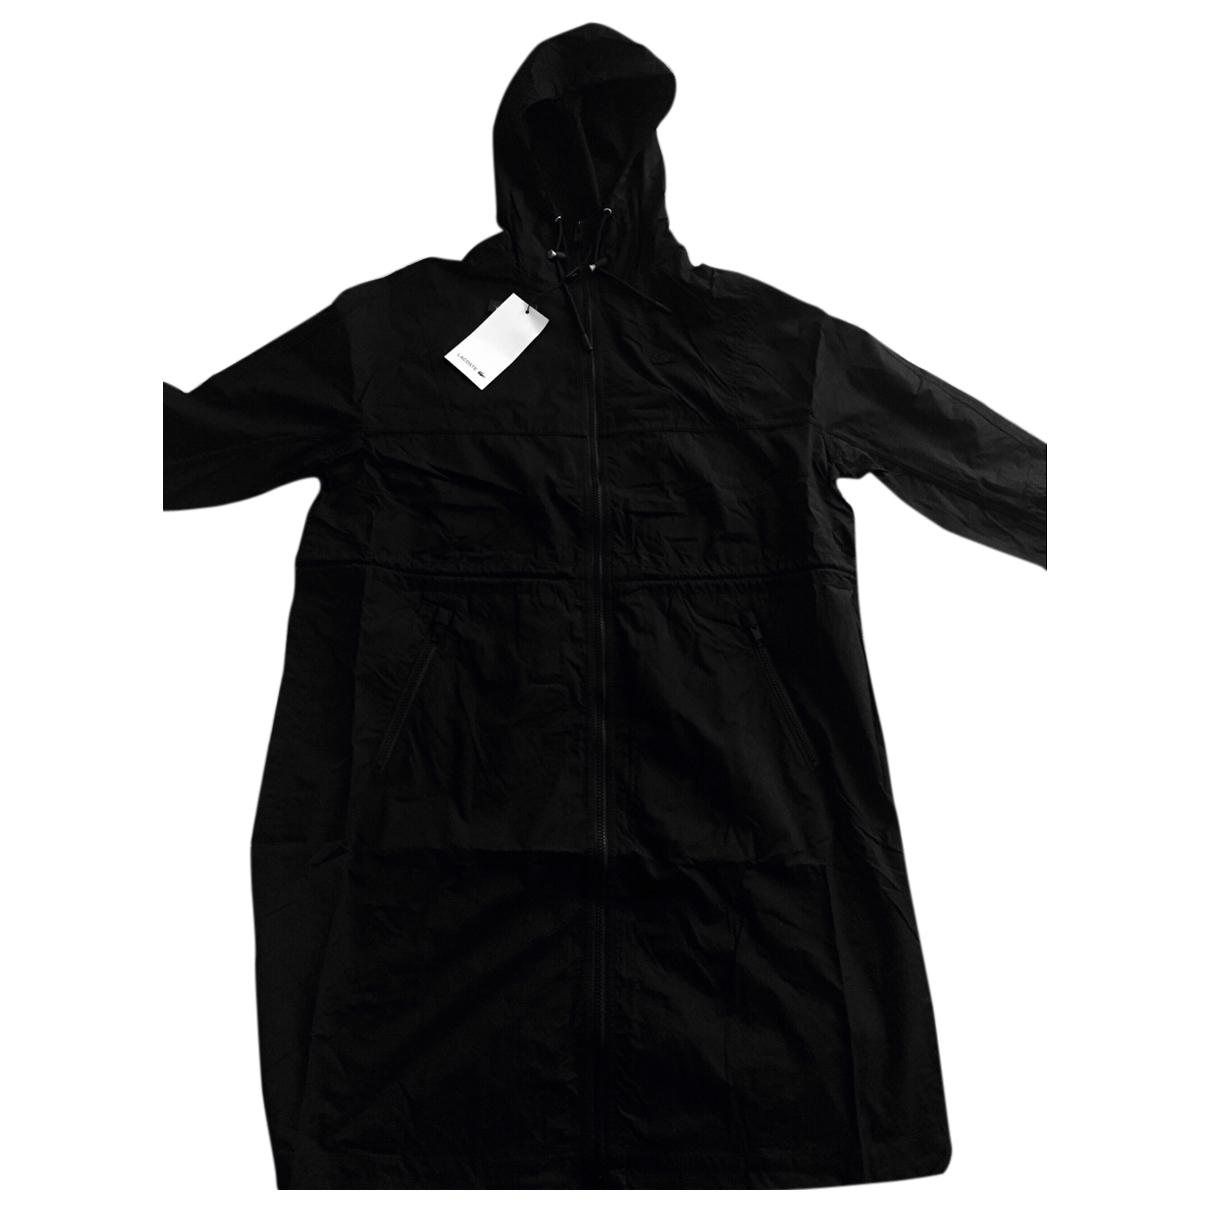 Lacoste \N Black coat for Women 34 FR